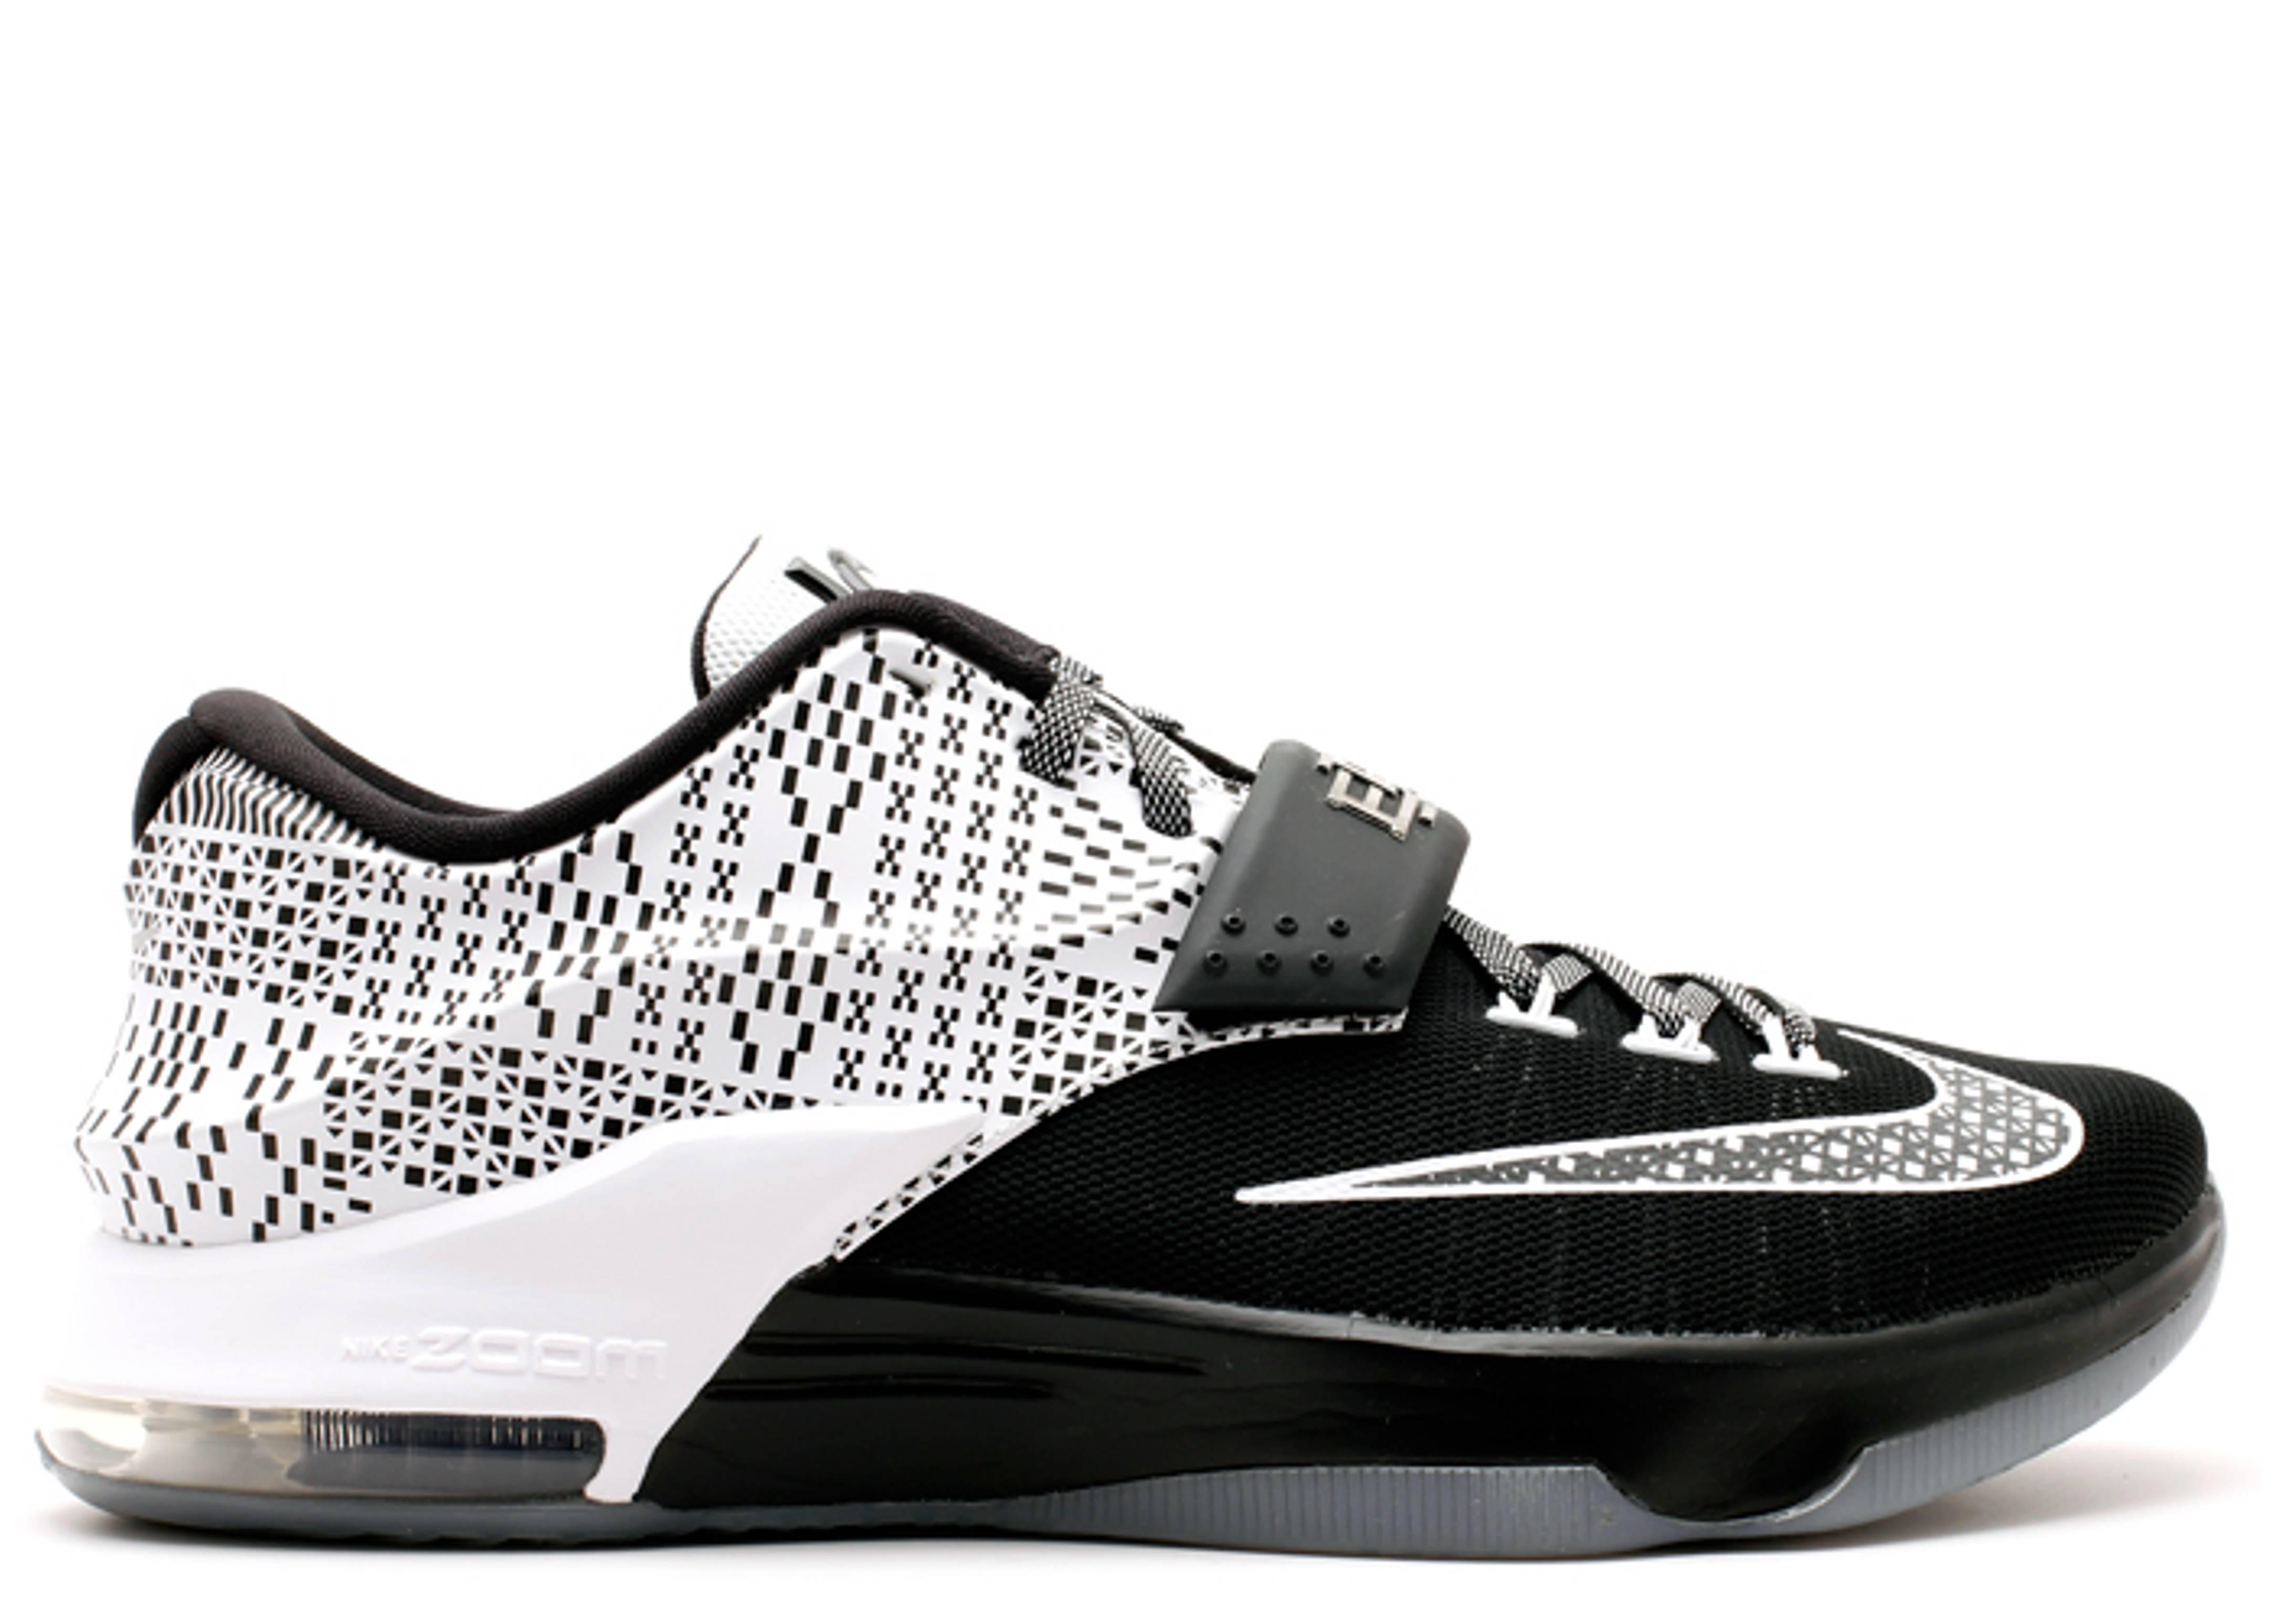 262d52d5c99 Kd 7 Bhm - Nike - 718817 010 - black white-wolf grey